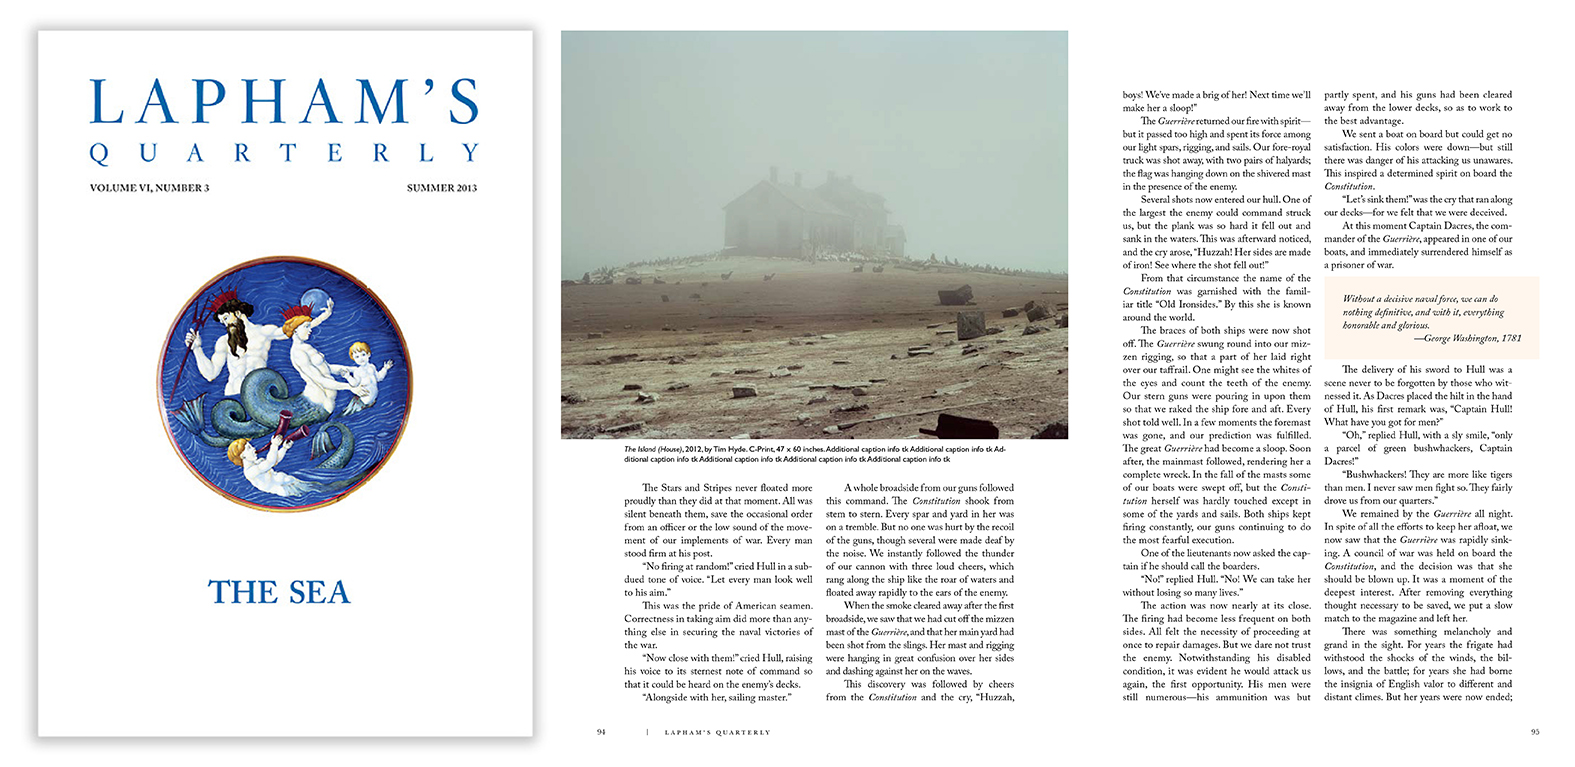 """The Sea"", Lapham's Quarterly Vol. VI, 2013. Photo by Tim Hyde."